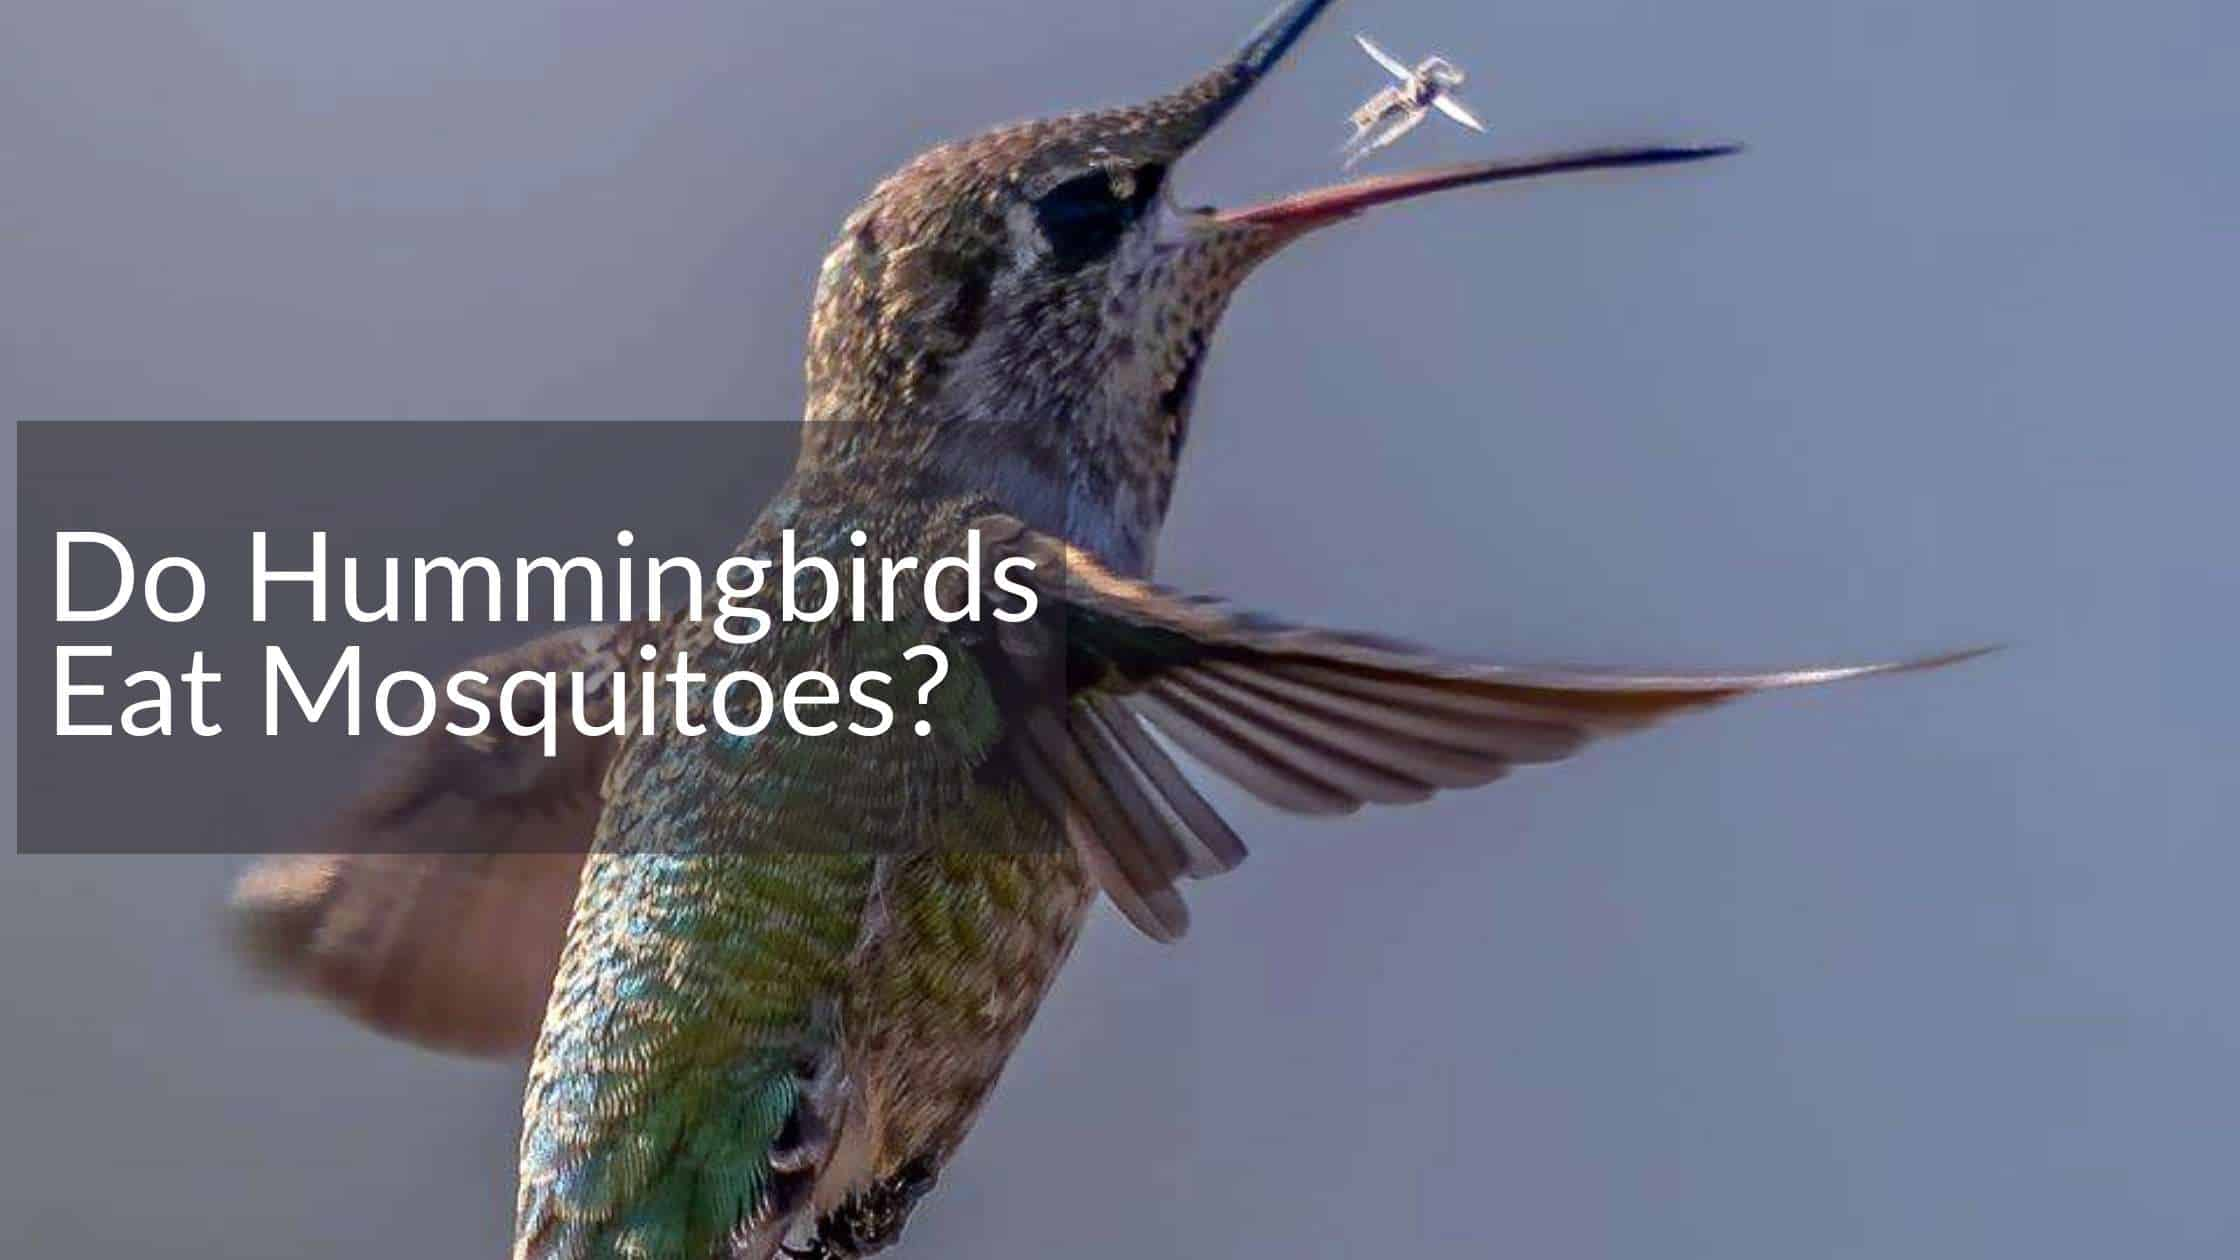 hummingbird eating mosquito